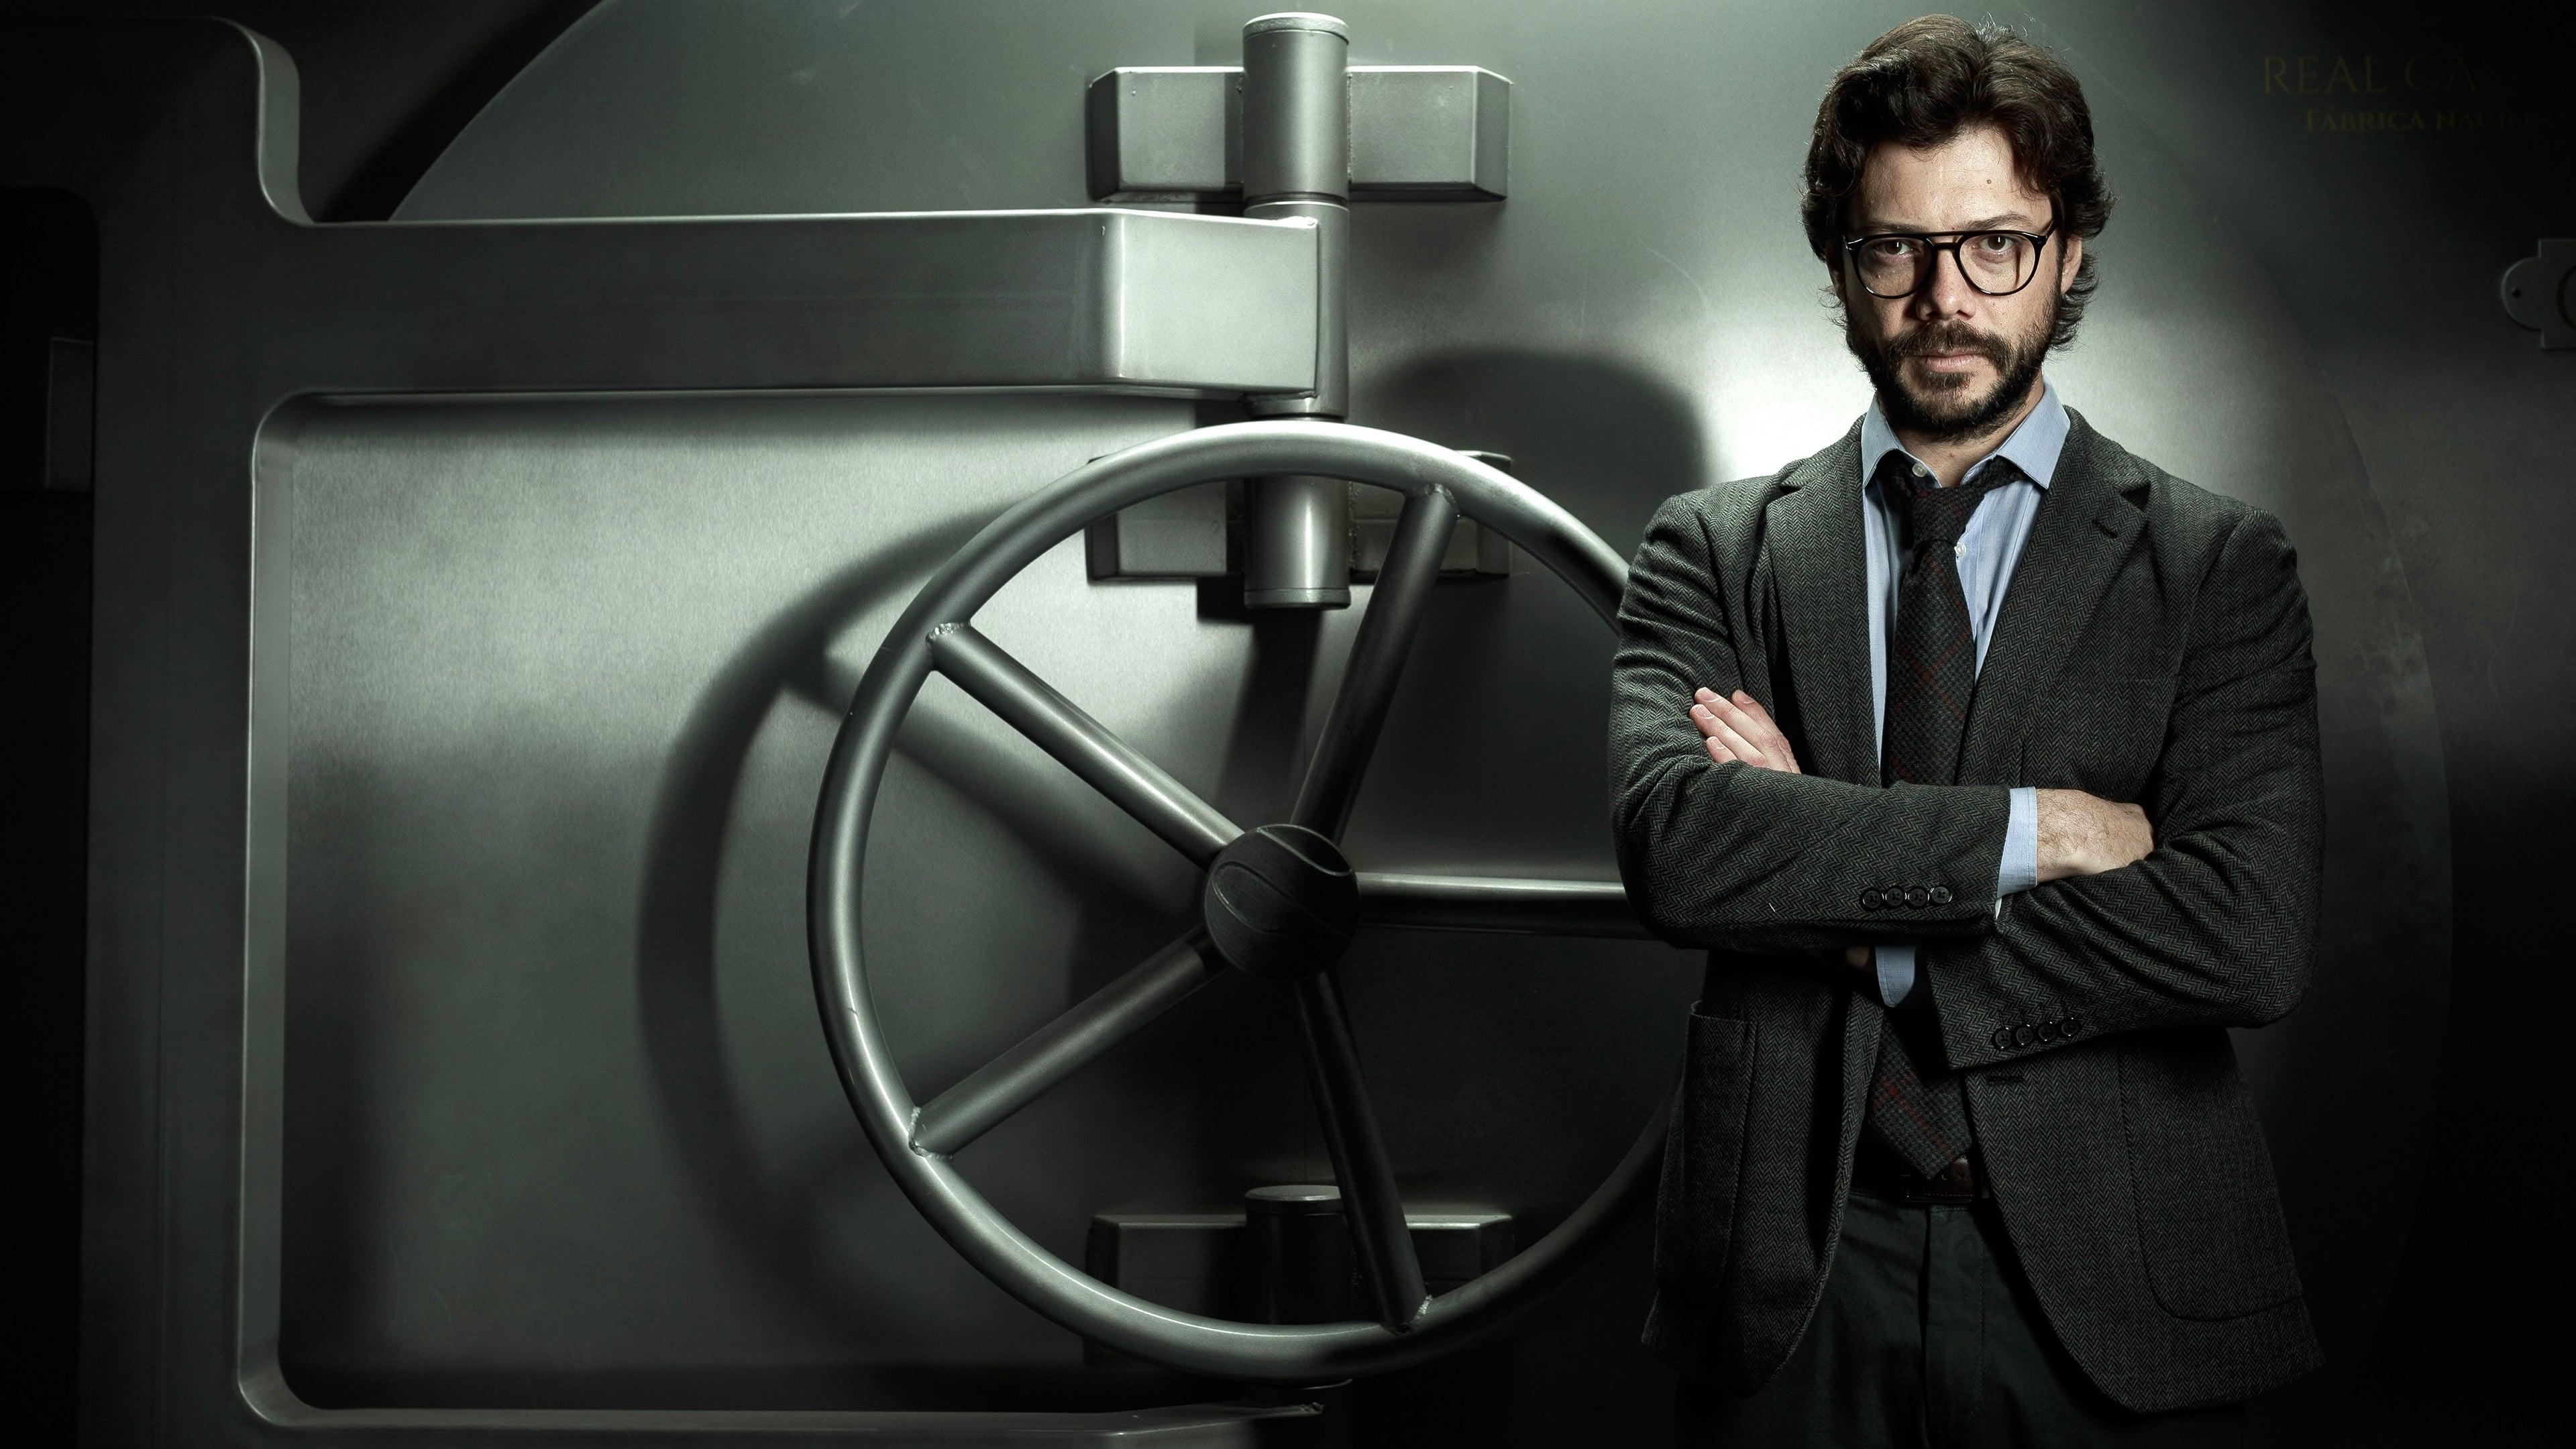 Parrot Analytics: Spanish drama tops French digital original in-demand list